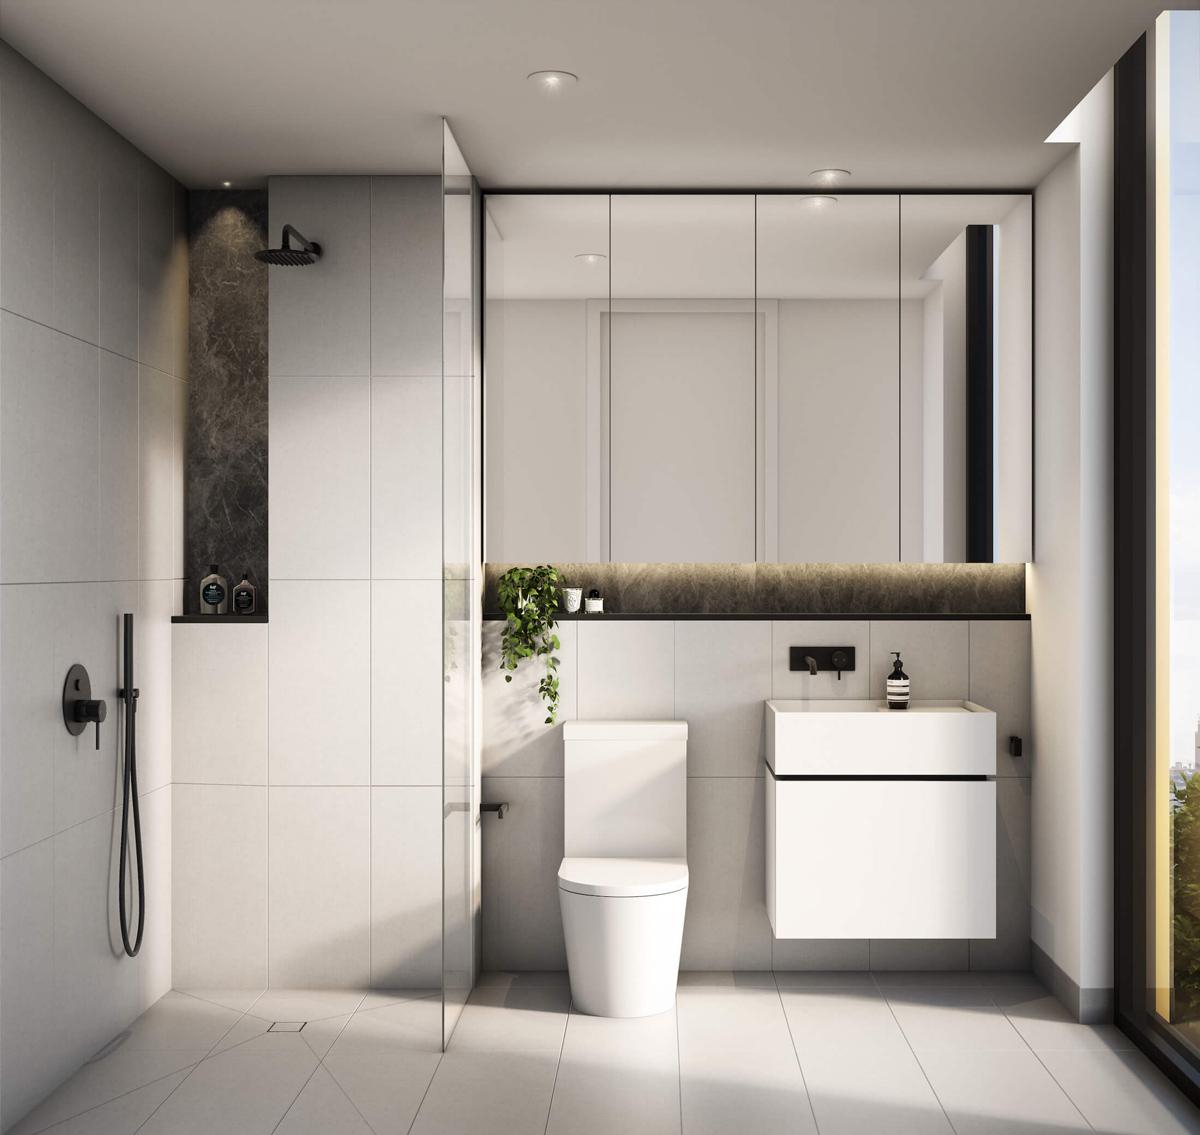 alchemy_bathroom_1200x1138px.jpg Alchemy Interior Bathroom